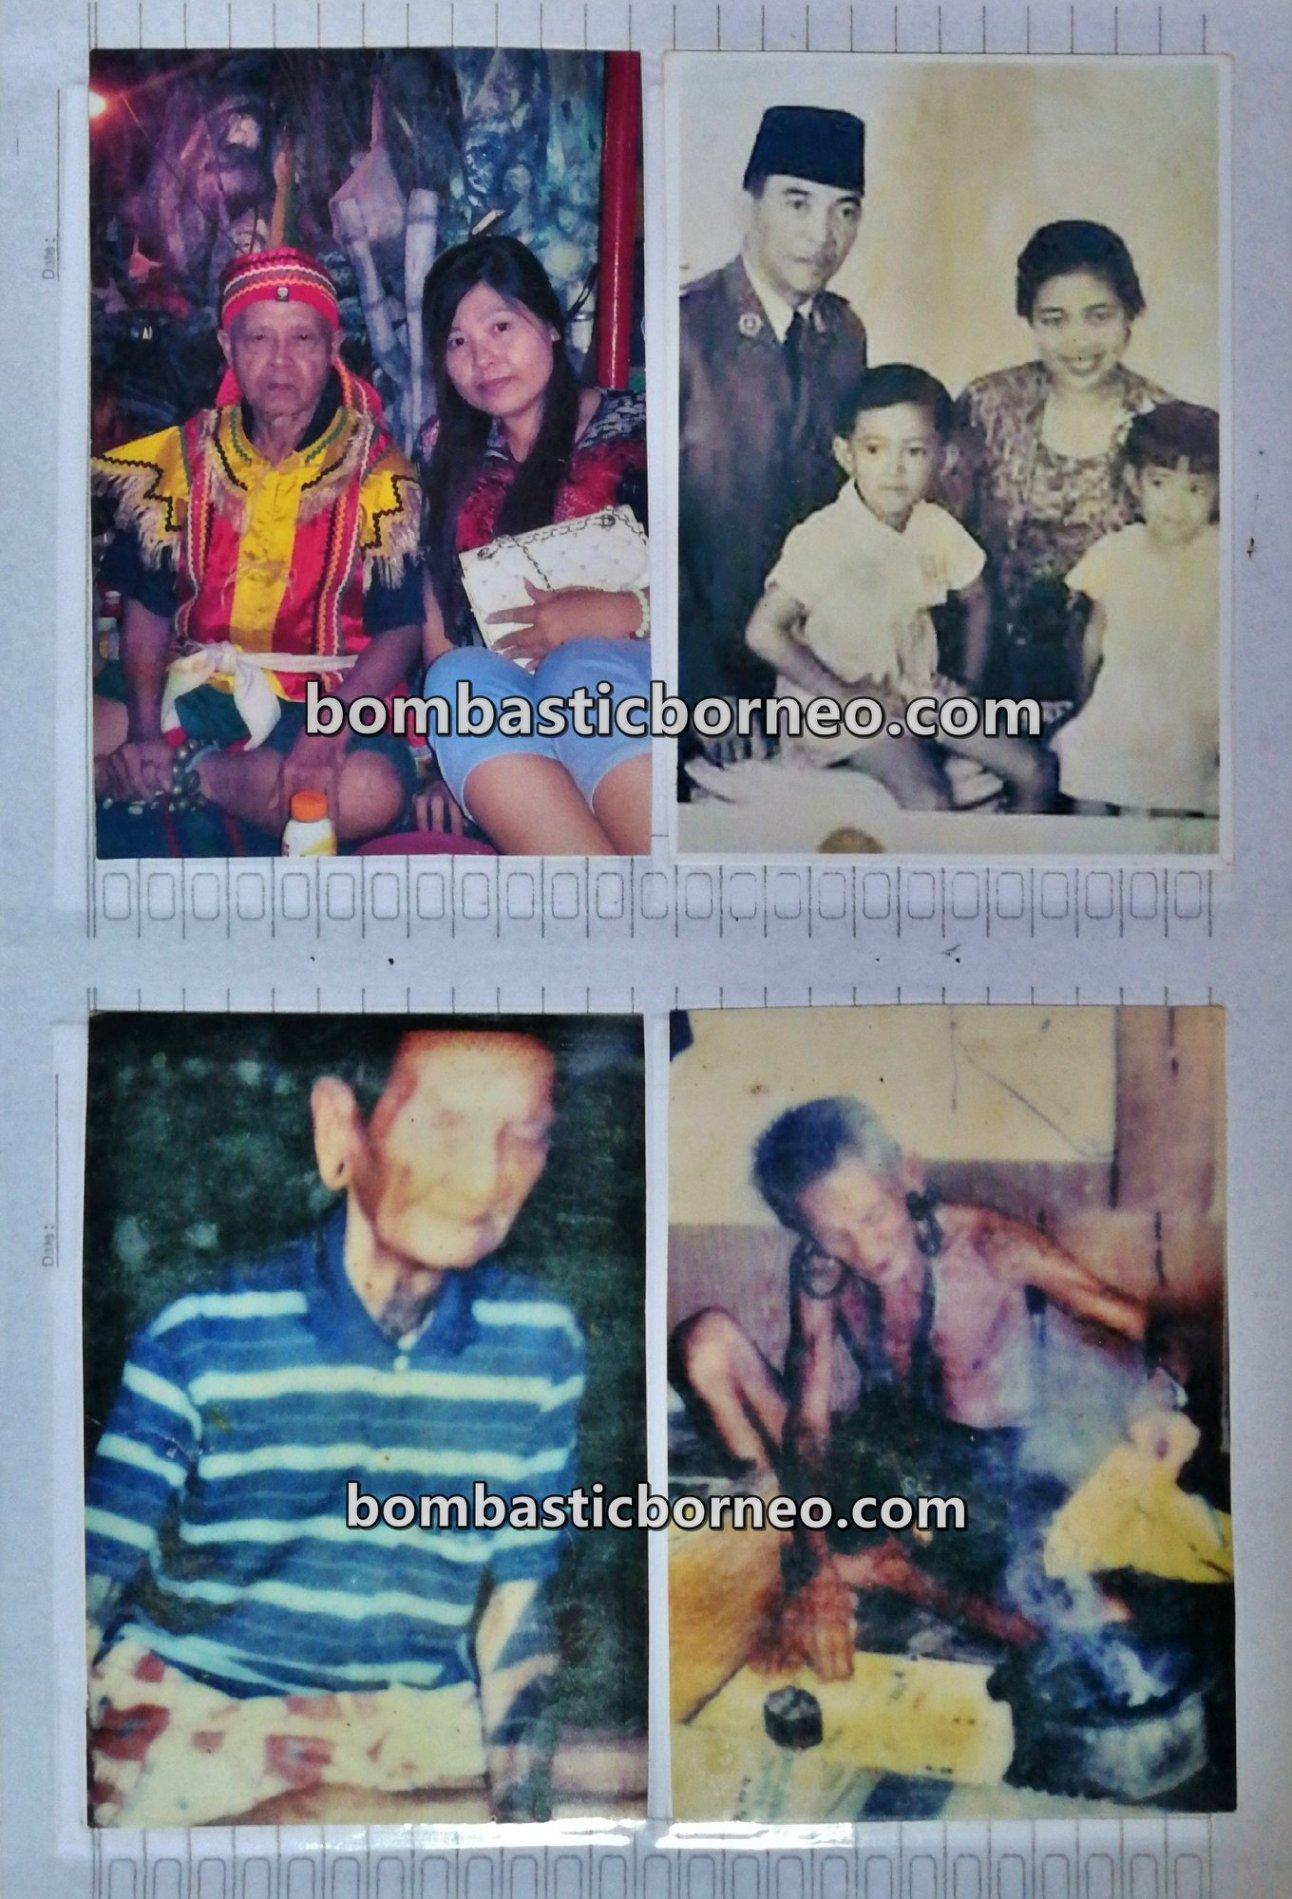 Panglima Siru, Dukun, Sifu, shaman, Siang Lim, history, sejarah, Dusun Paling Dalam, Sango, Sanggau Ledo, village, Borneo, 探索婆罗洲游踪, 印尼西加里曼丹, 孟加映法師